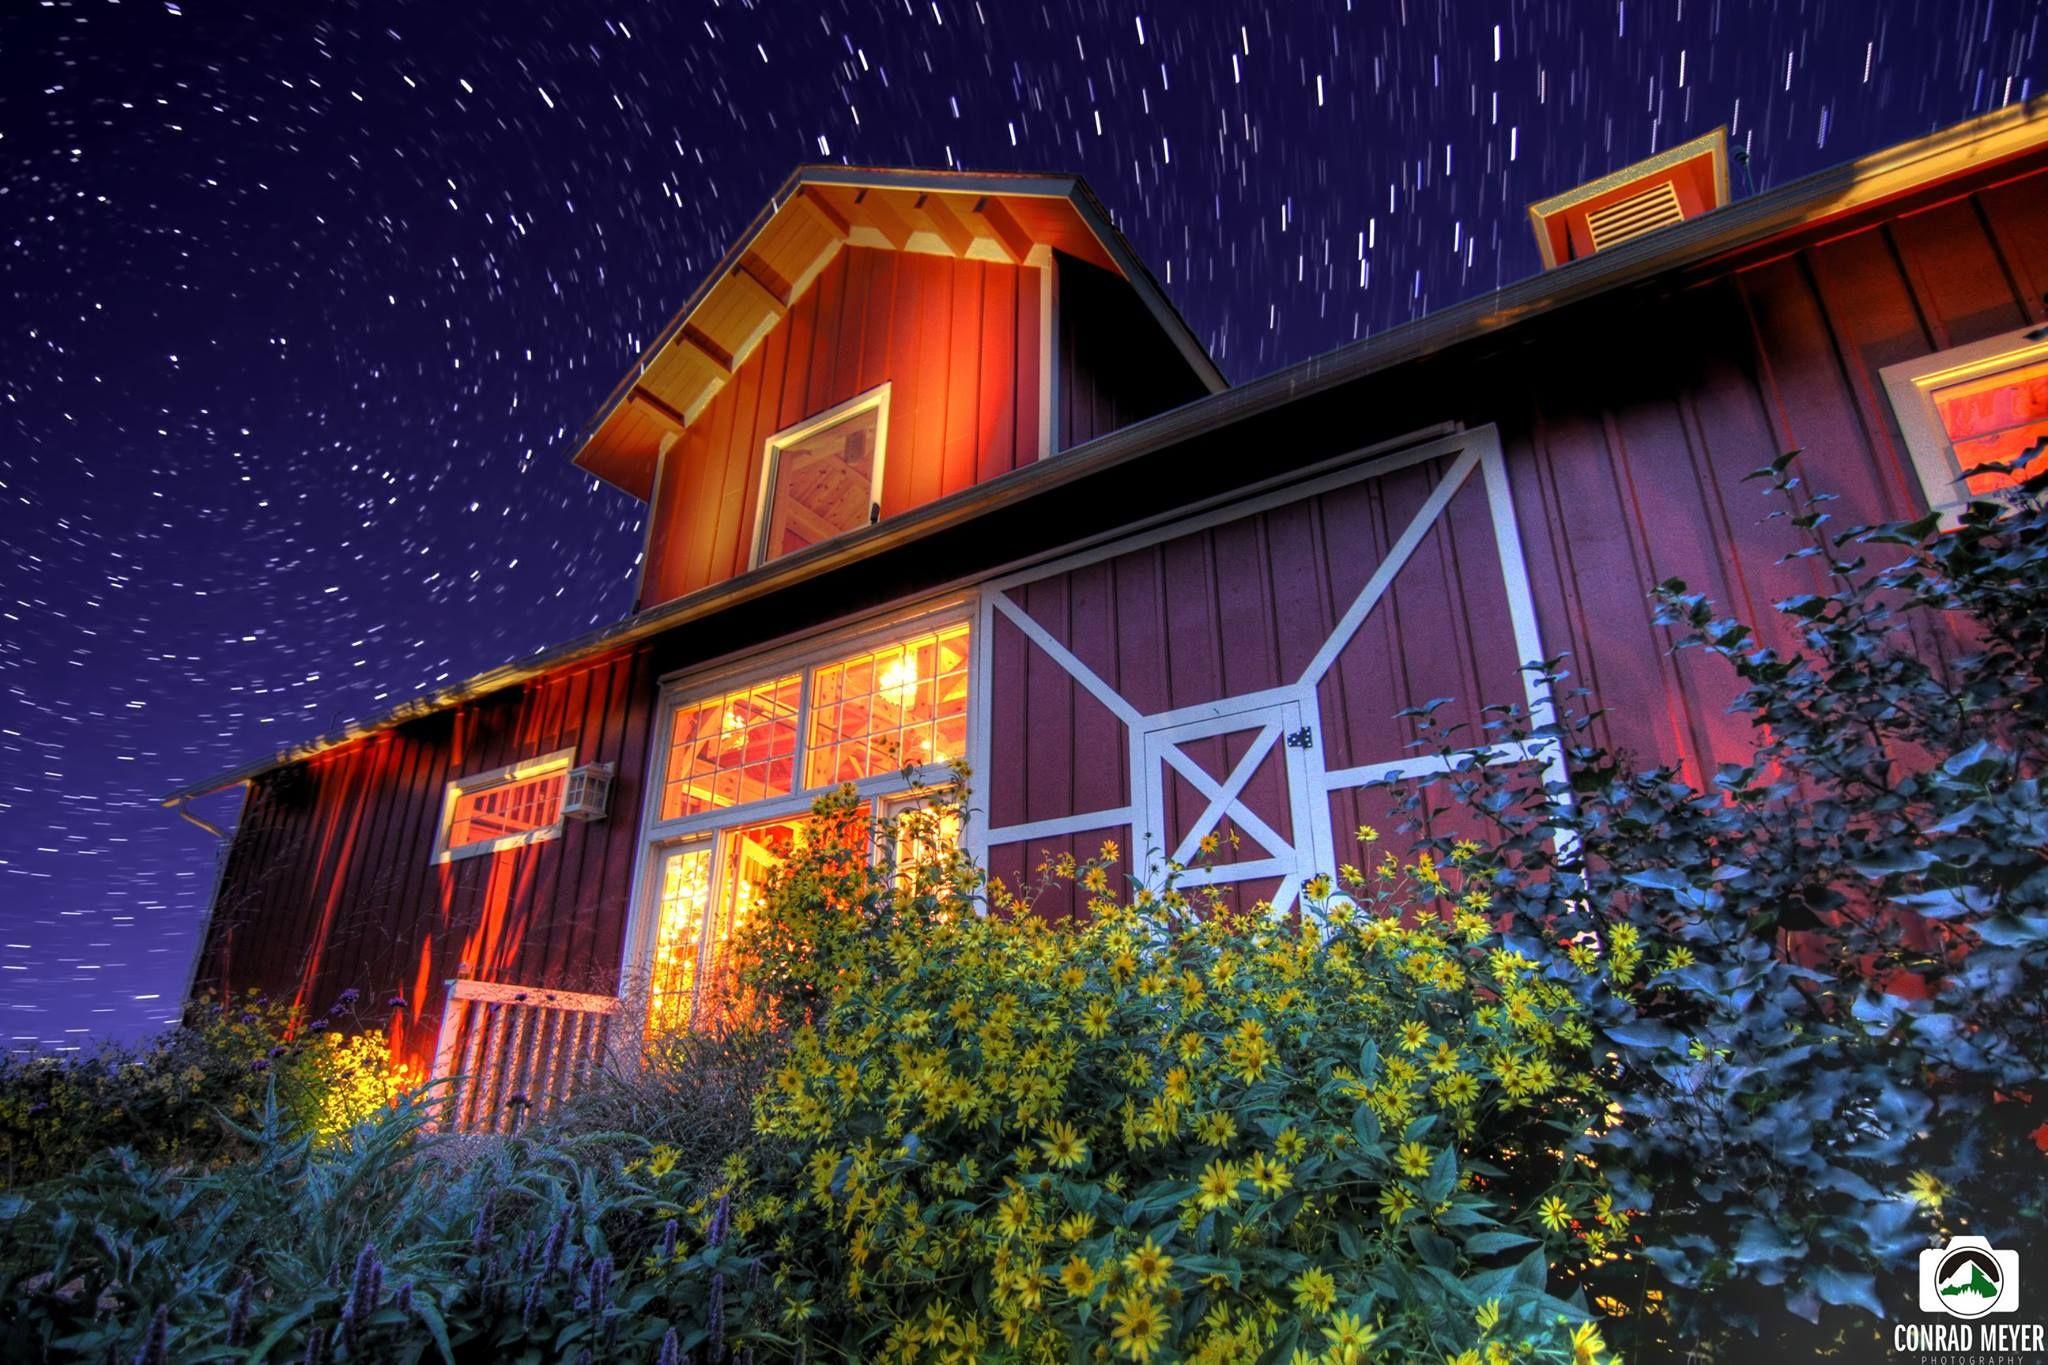 De Novo Barn Decorah, Ia House styles, Decorah, Wedding